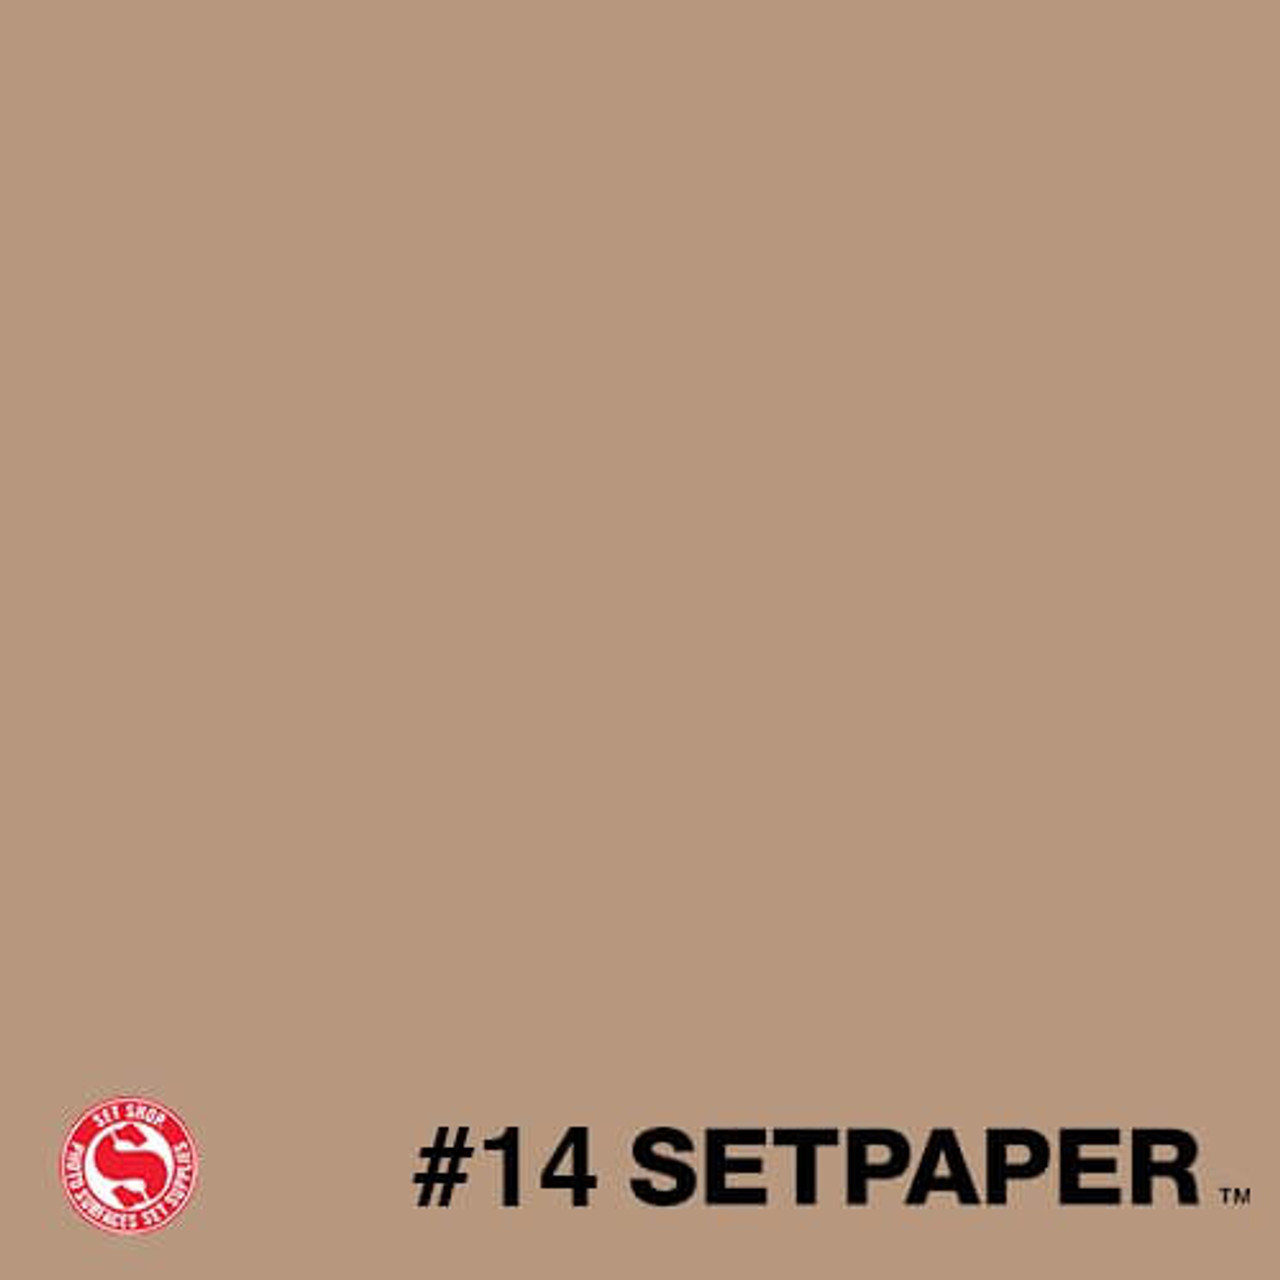 "214 SETPAPER - NATURAL 26"" x 36' (0.66m  X 11m)"